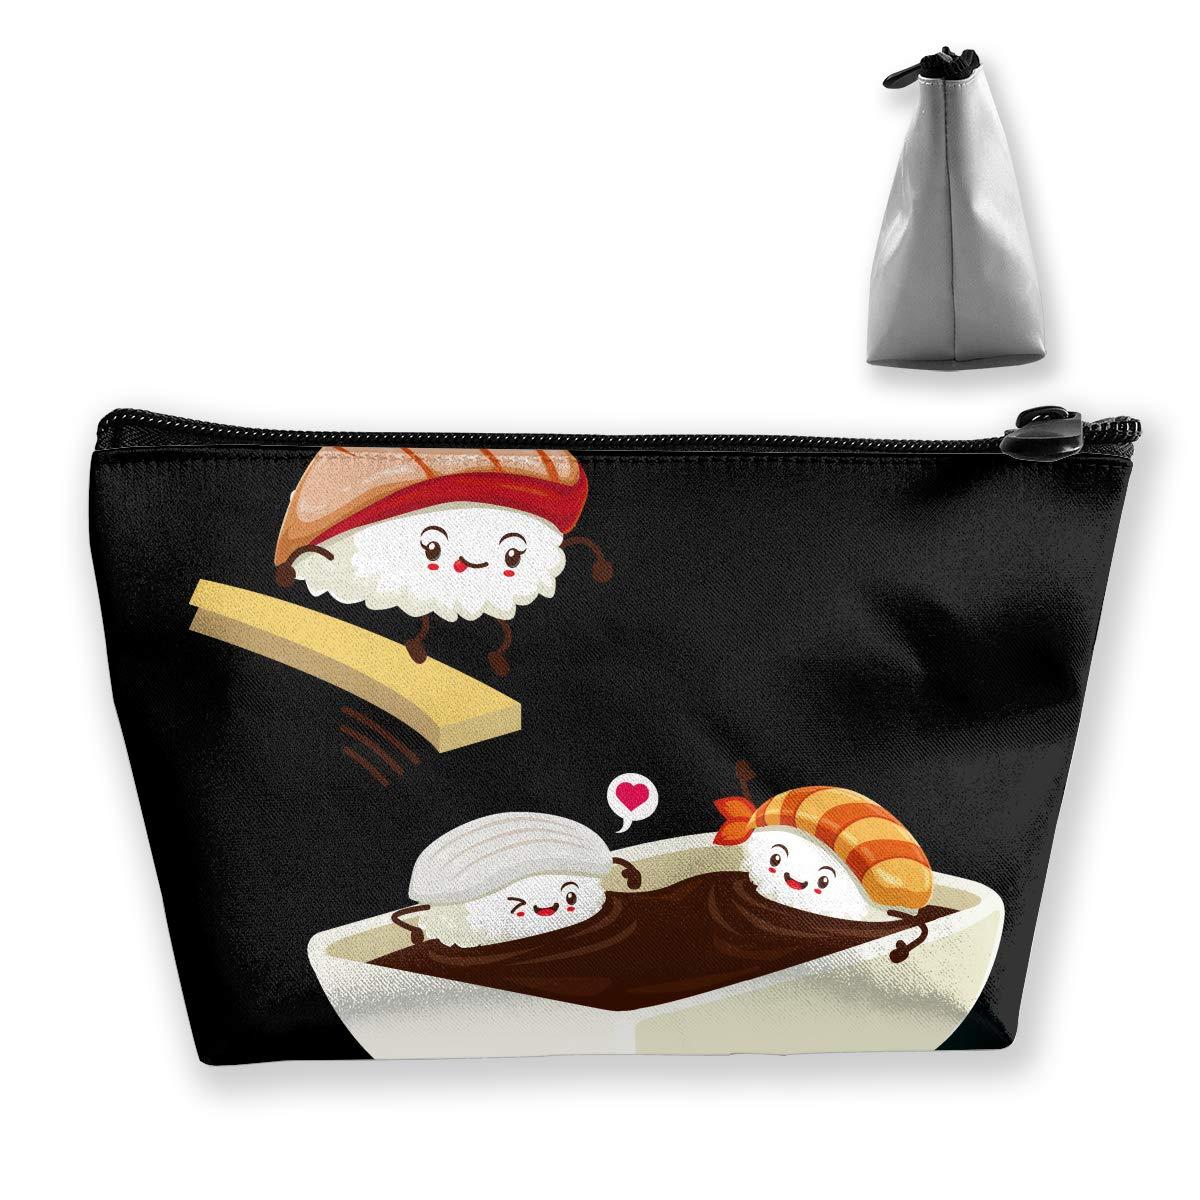 Trapezoid Toiletry Pouch Portable Travel Bag Sushi Take Shower Zipper Wallet